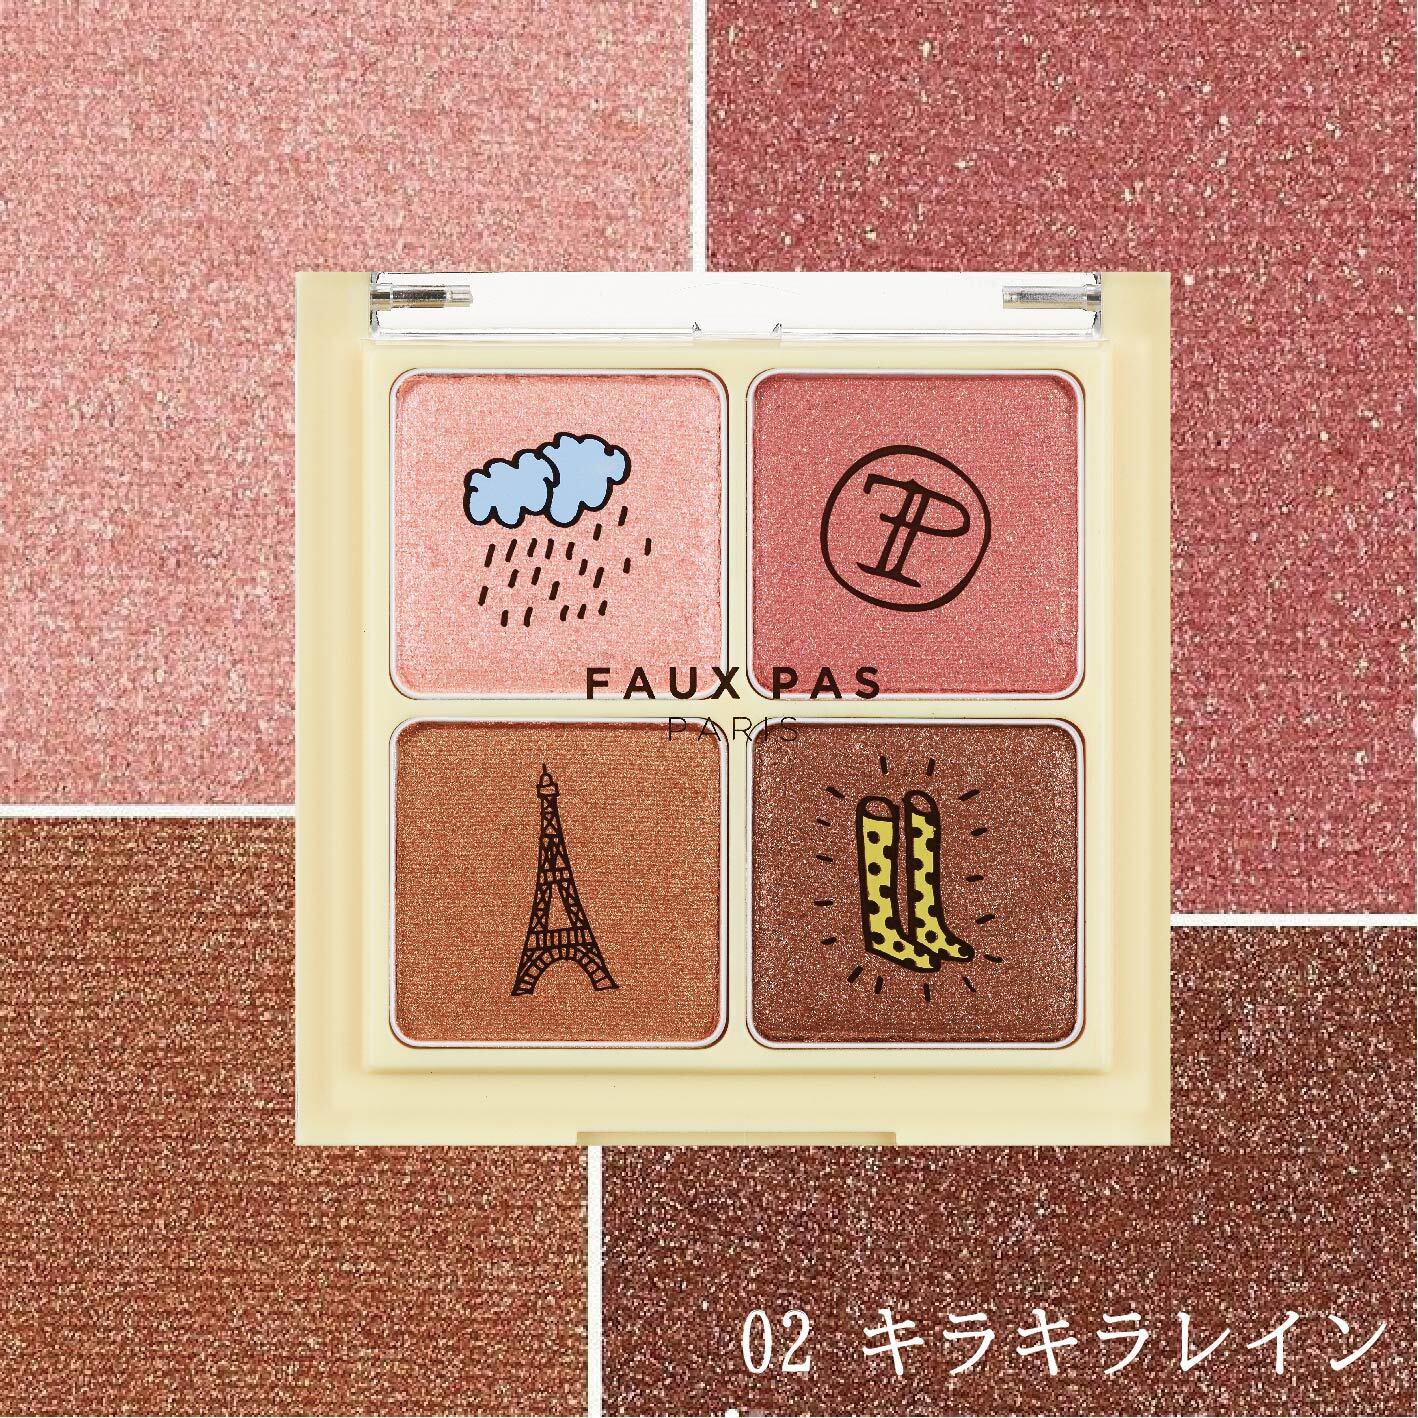 【FAUX PAS PARIS】#MOTDシャドーパレット2号 キラキラレイン【新発売】韓国コスメ ポパパリ フォーパパリ